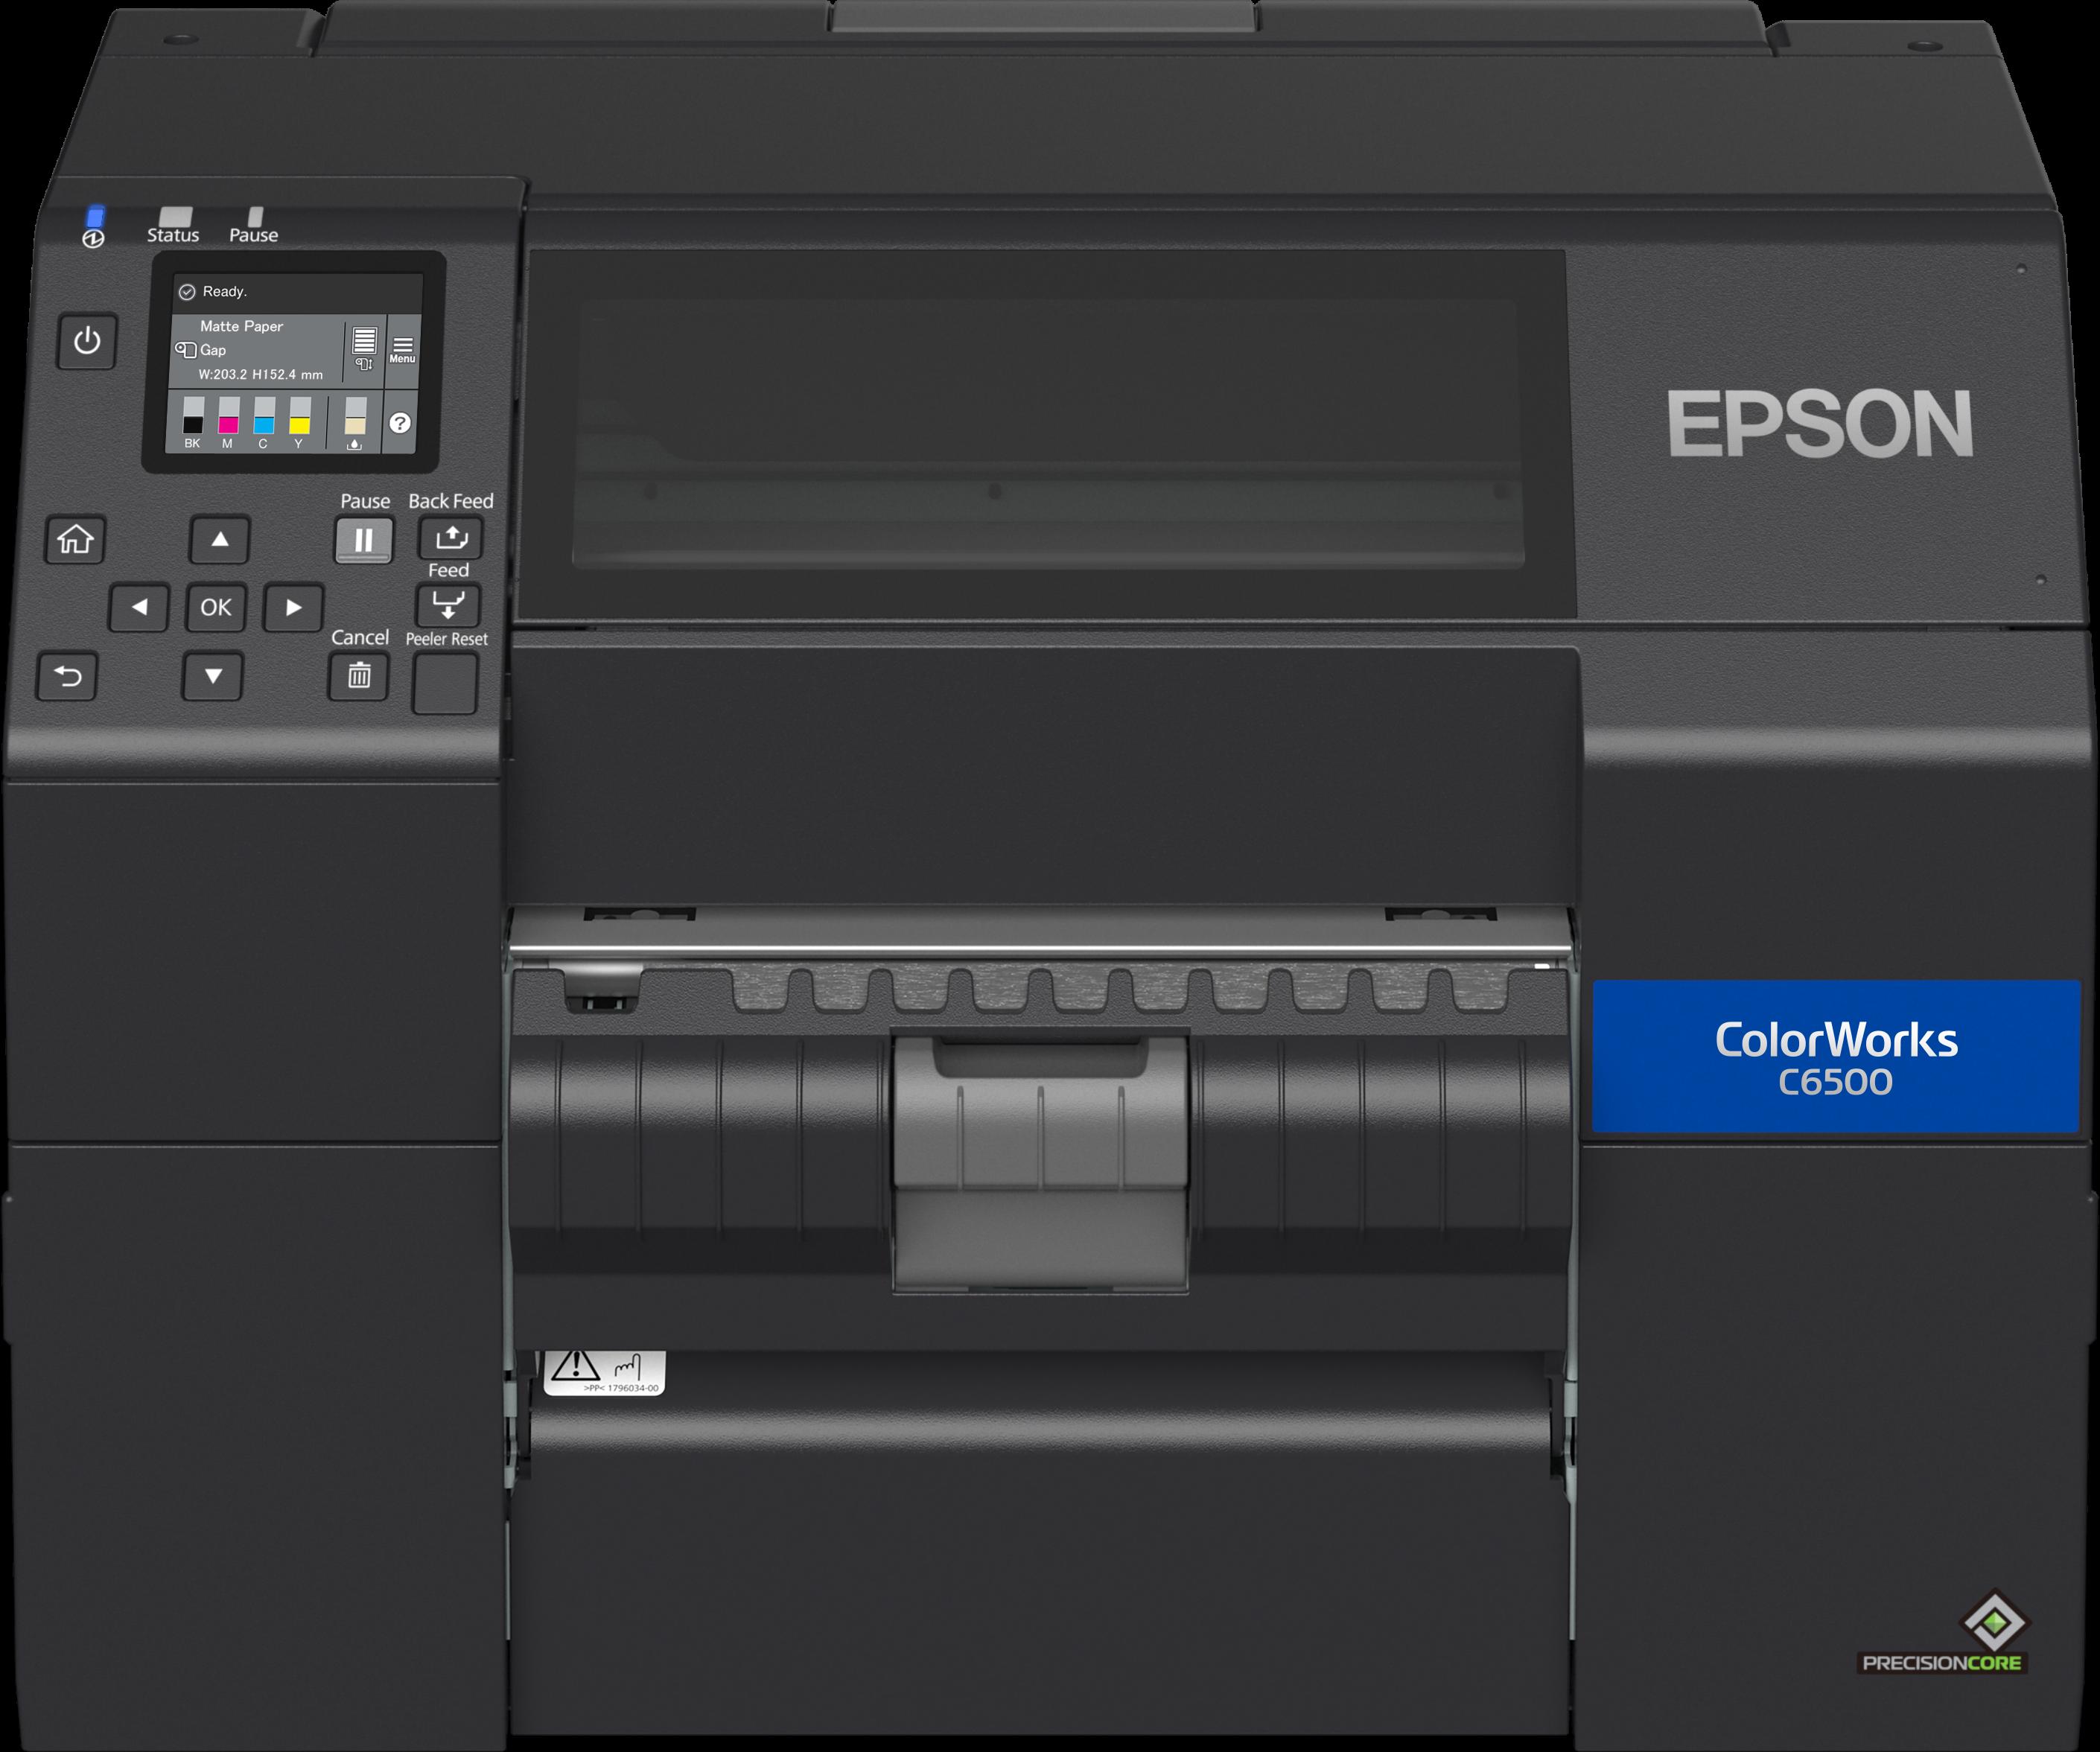 ColorWorks C6500Pe